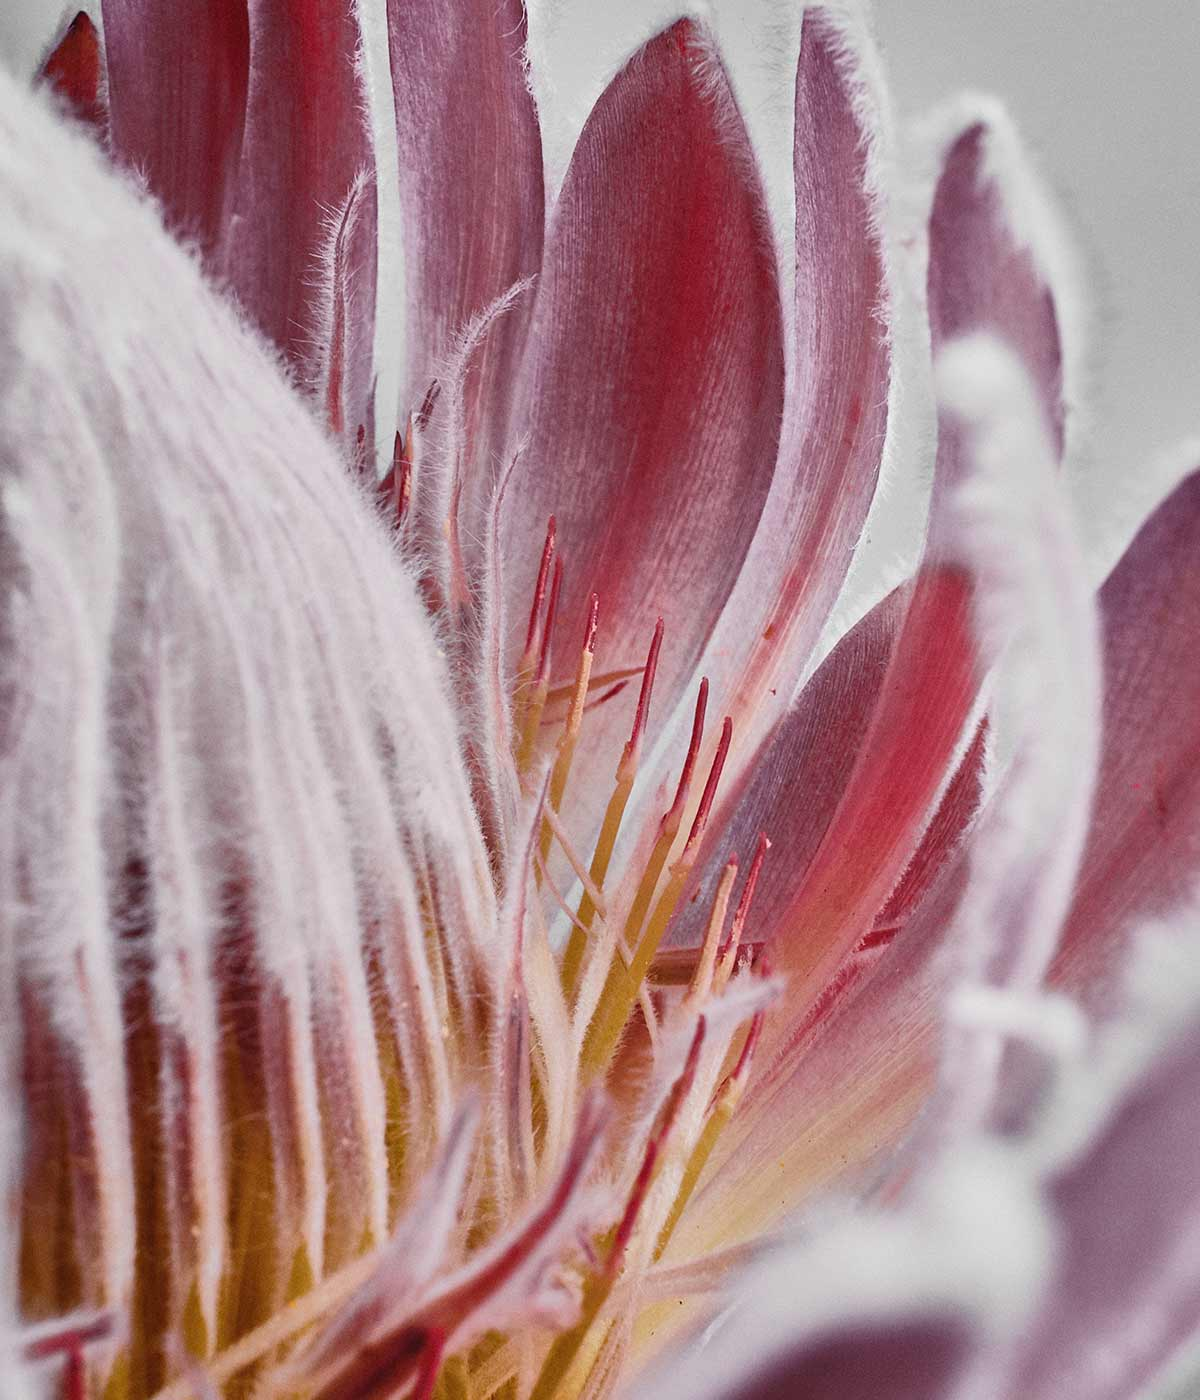 rawness natural parfume brescia pink